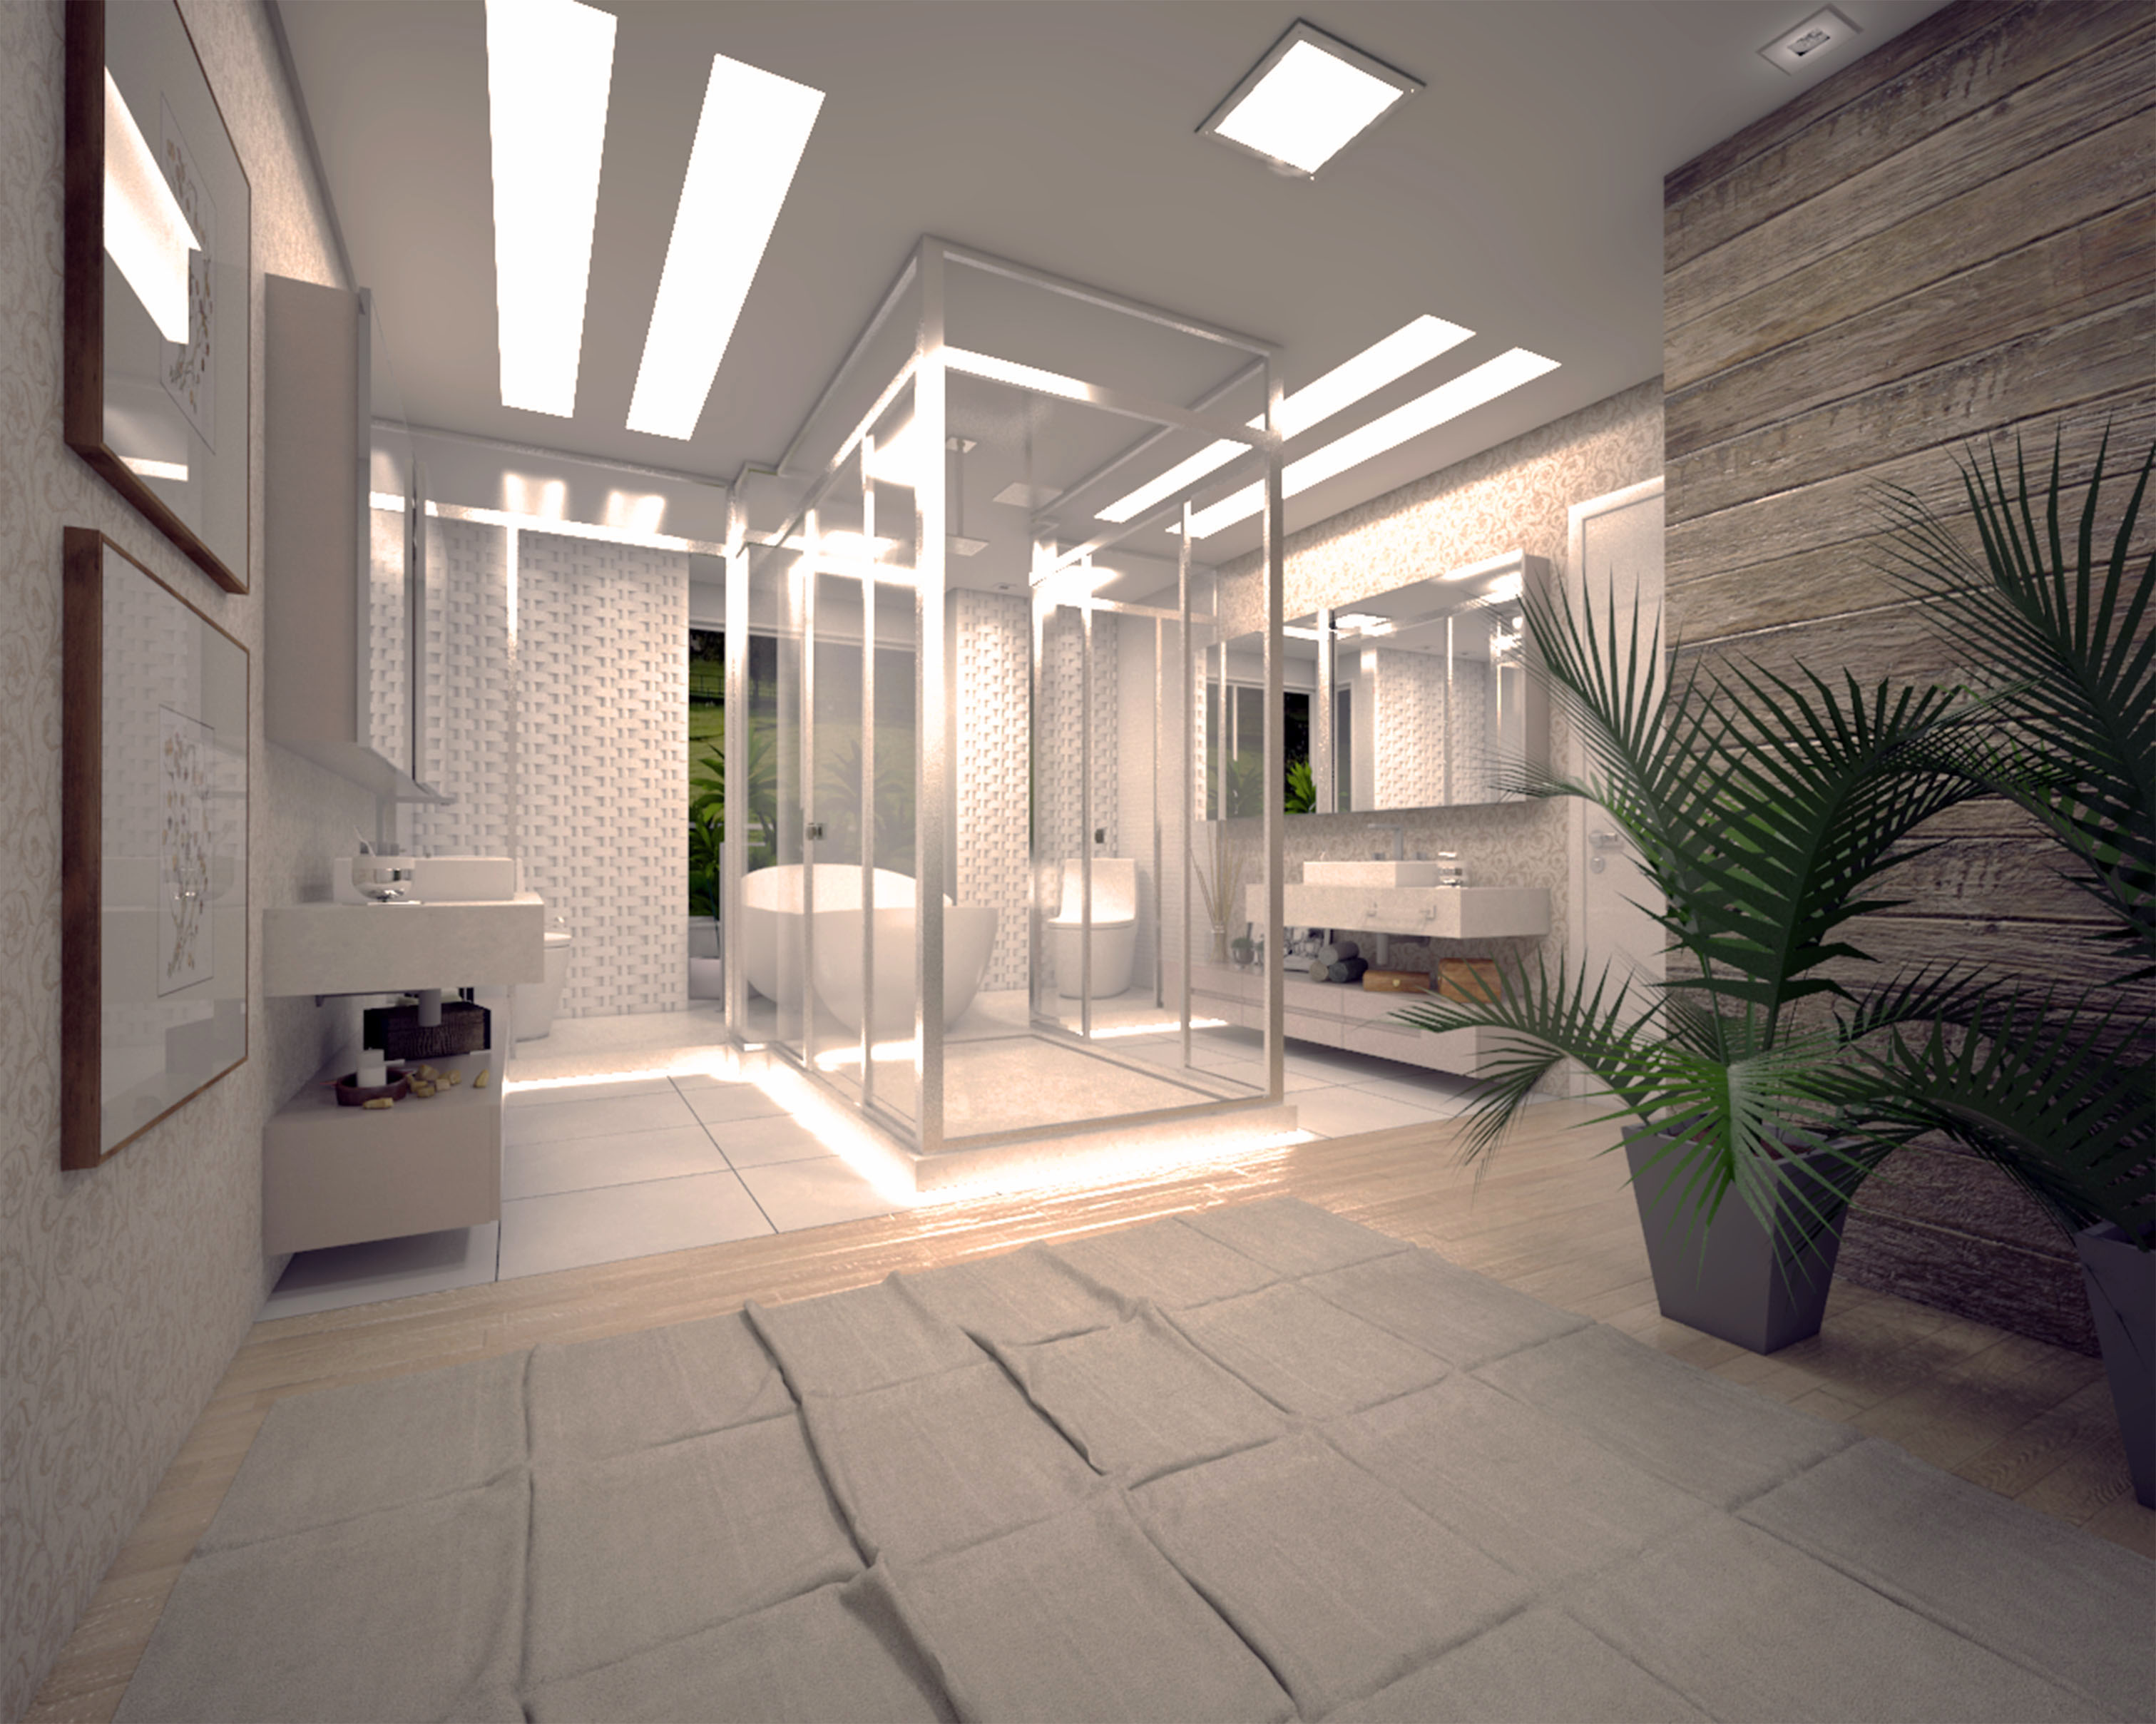 Casa Brusciana - Banheiro duplo